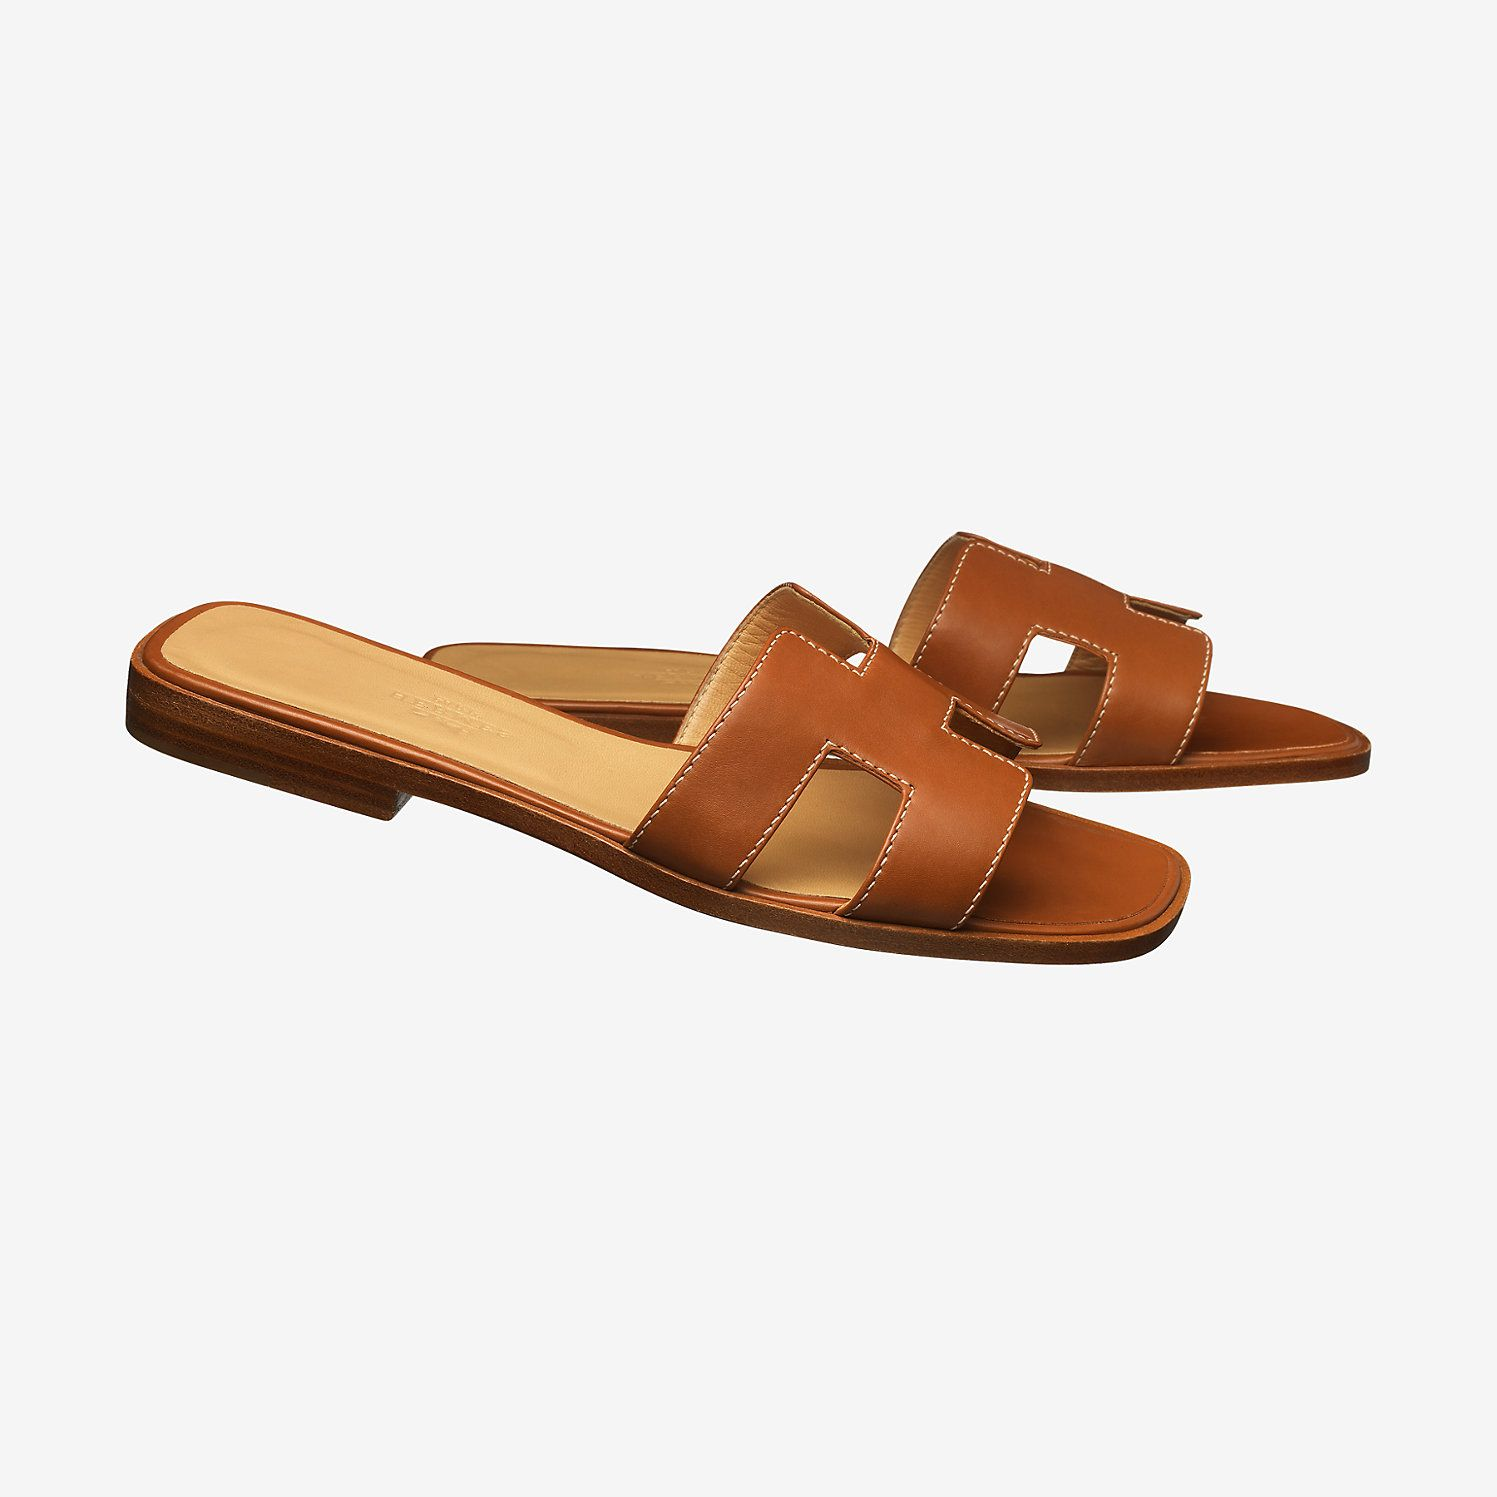 Sandals?   Hermes oran sandals